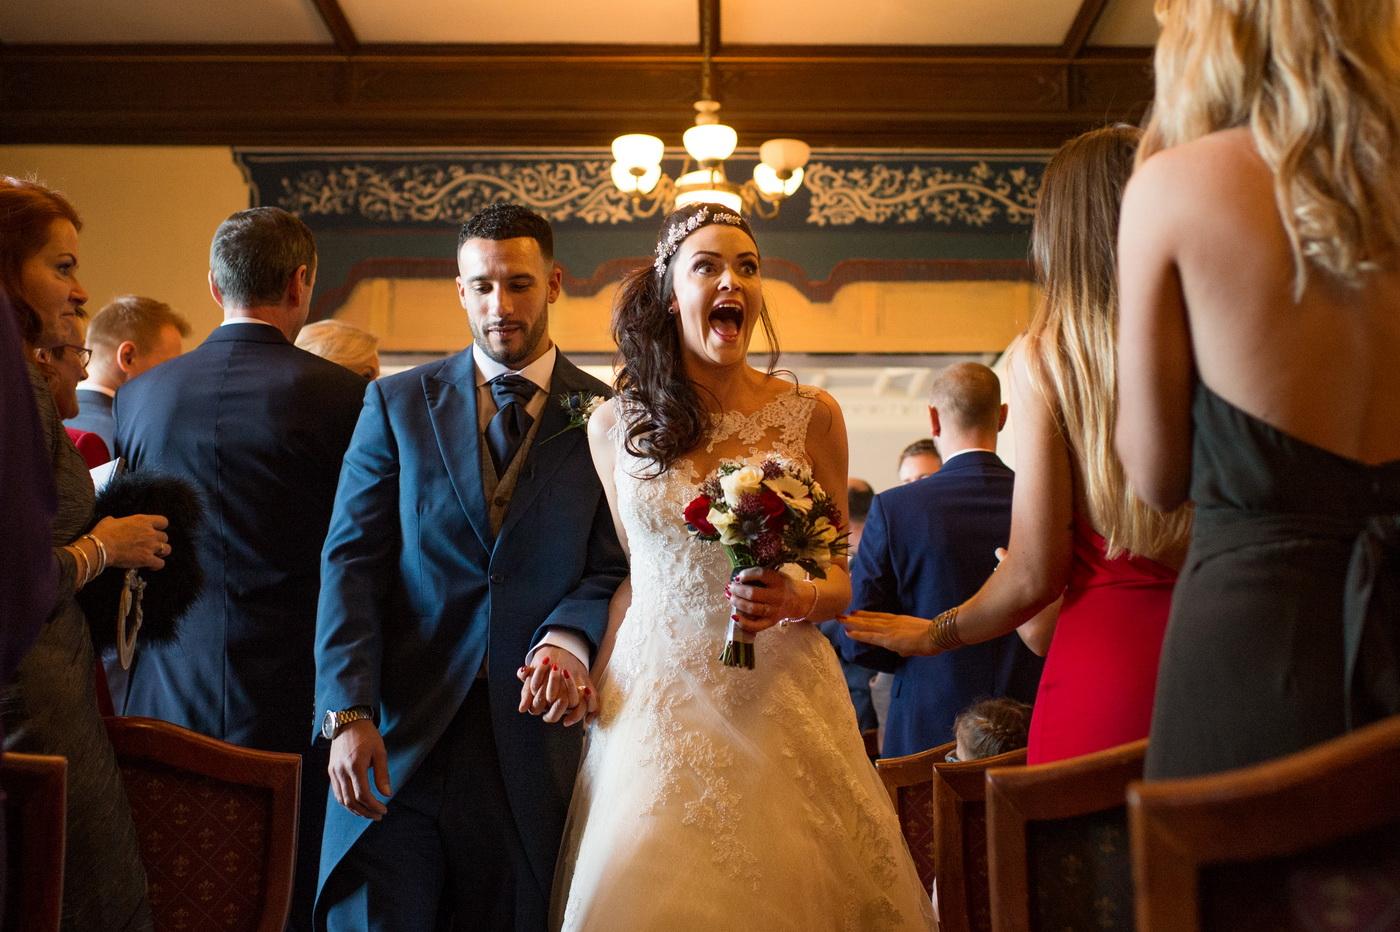 Destination Wedding Photographer_Marian Sterea_168.jpg